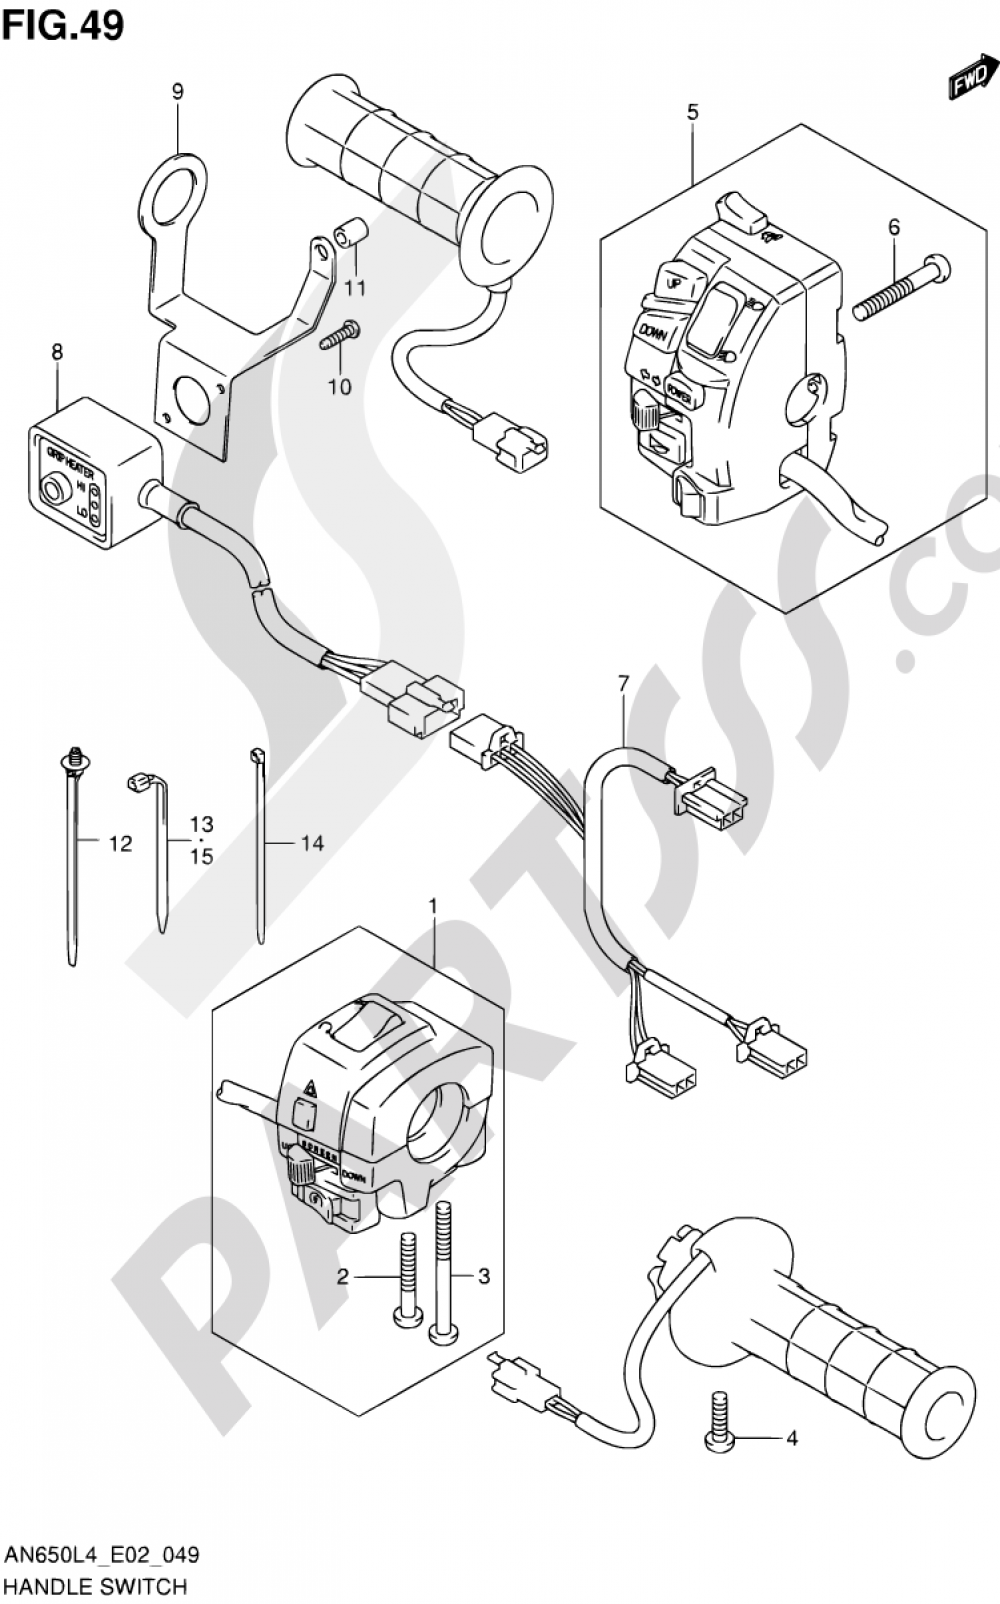 49 - HANDLE SWITCH (AN650ZL4 E02) Suzuki BURGMAN AN650Z 2014